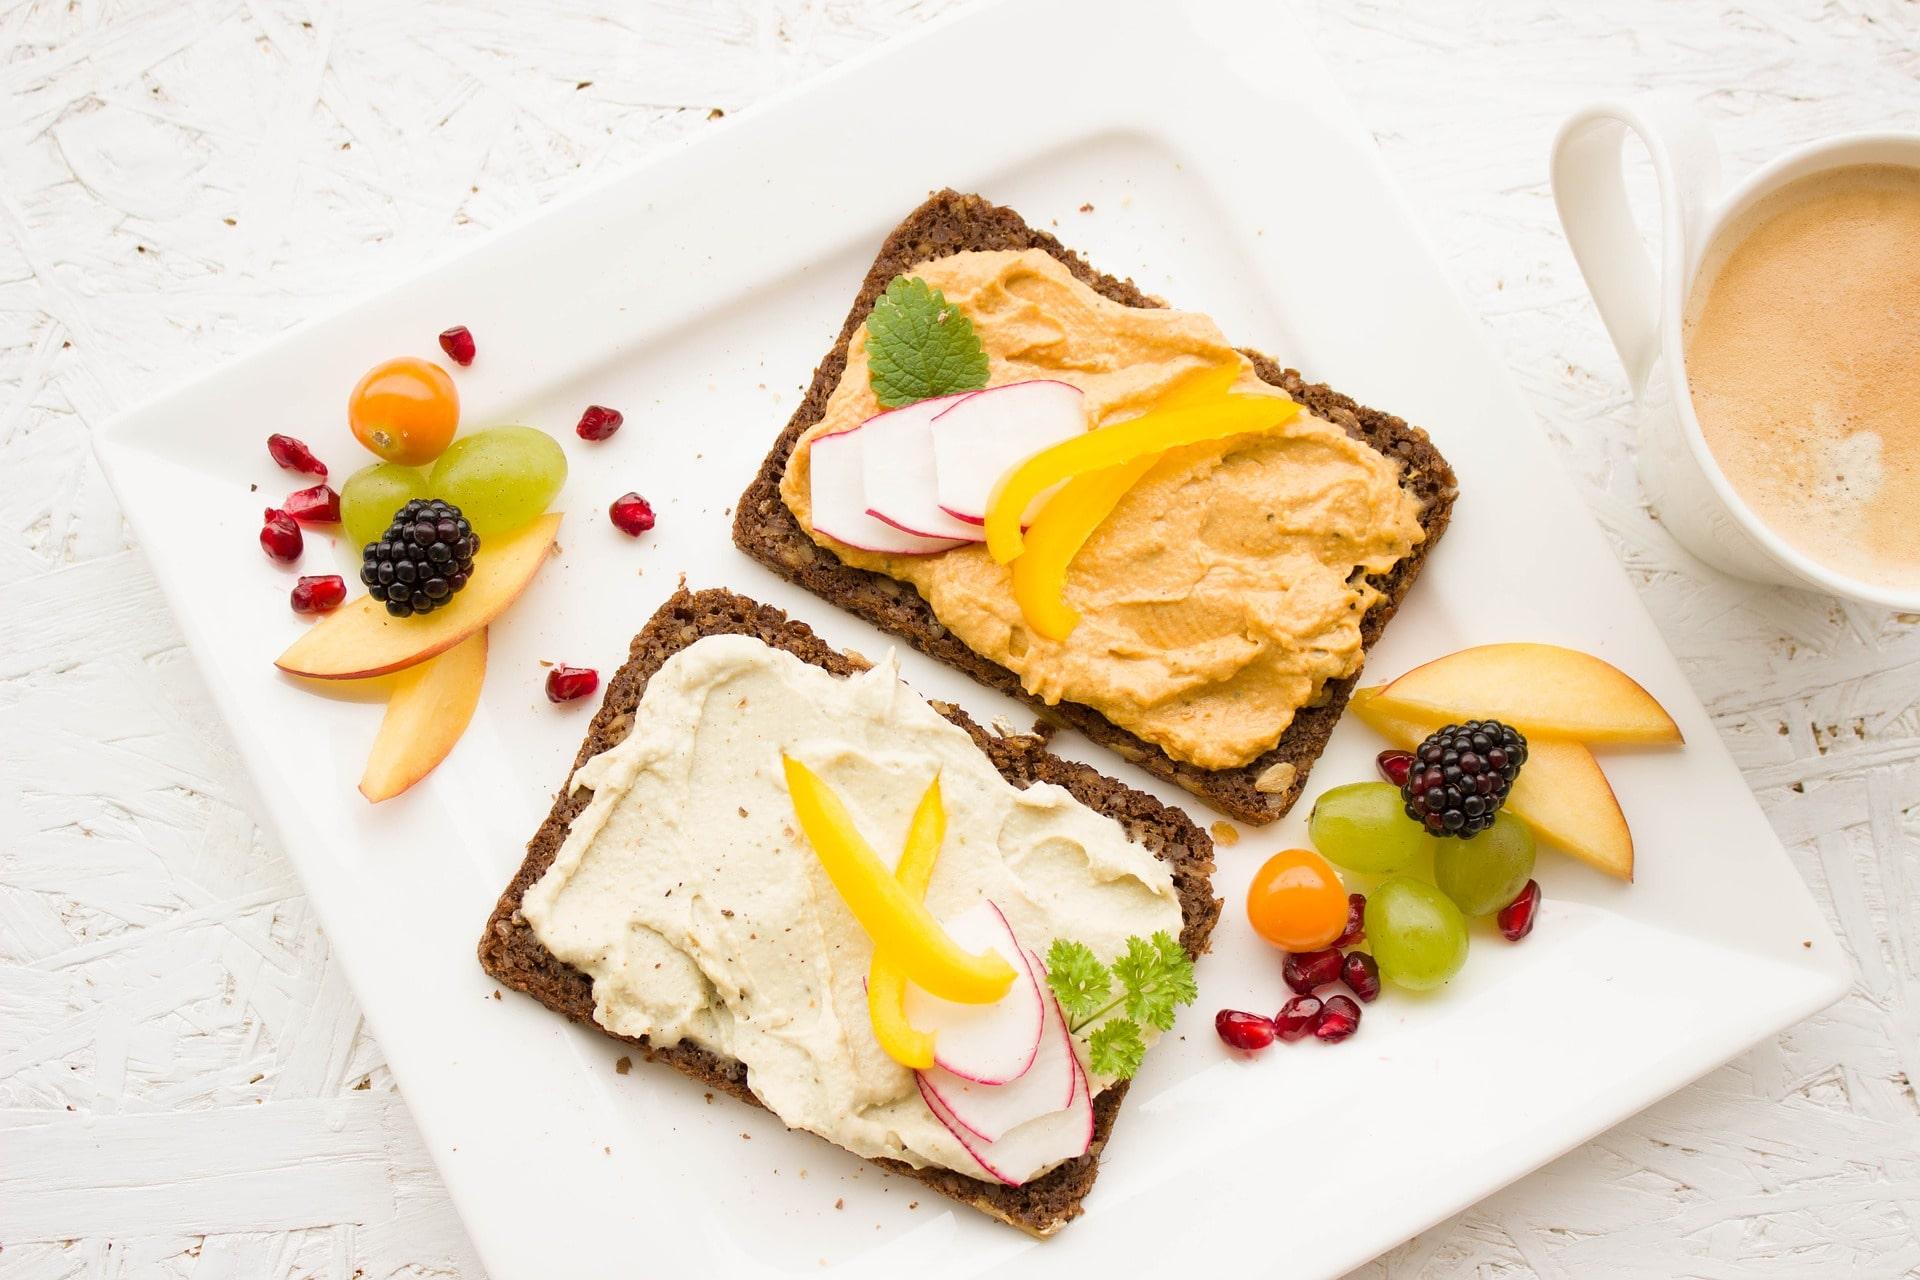 Sandwiches for Breakfast